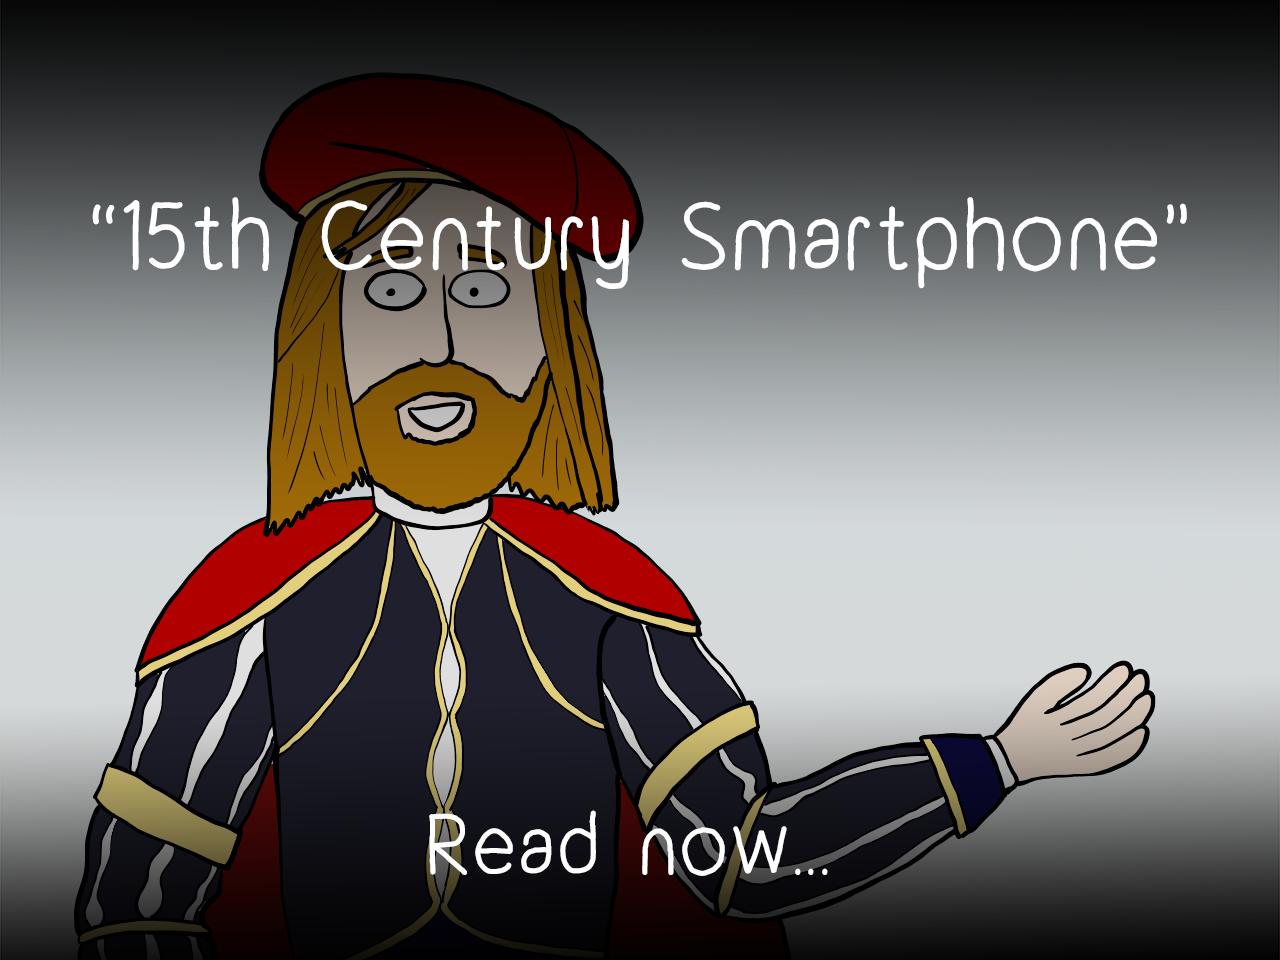 15th Century Smartphone